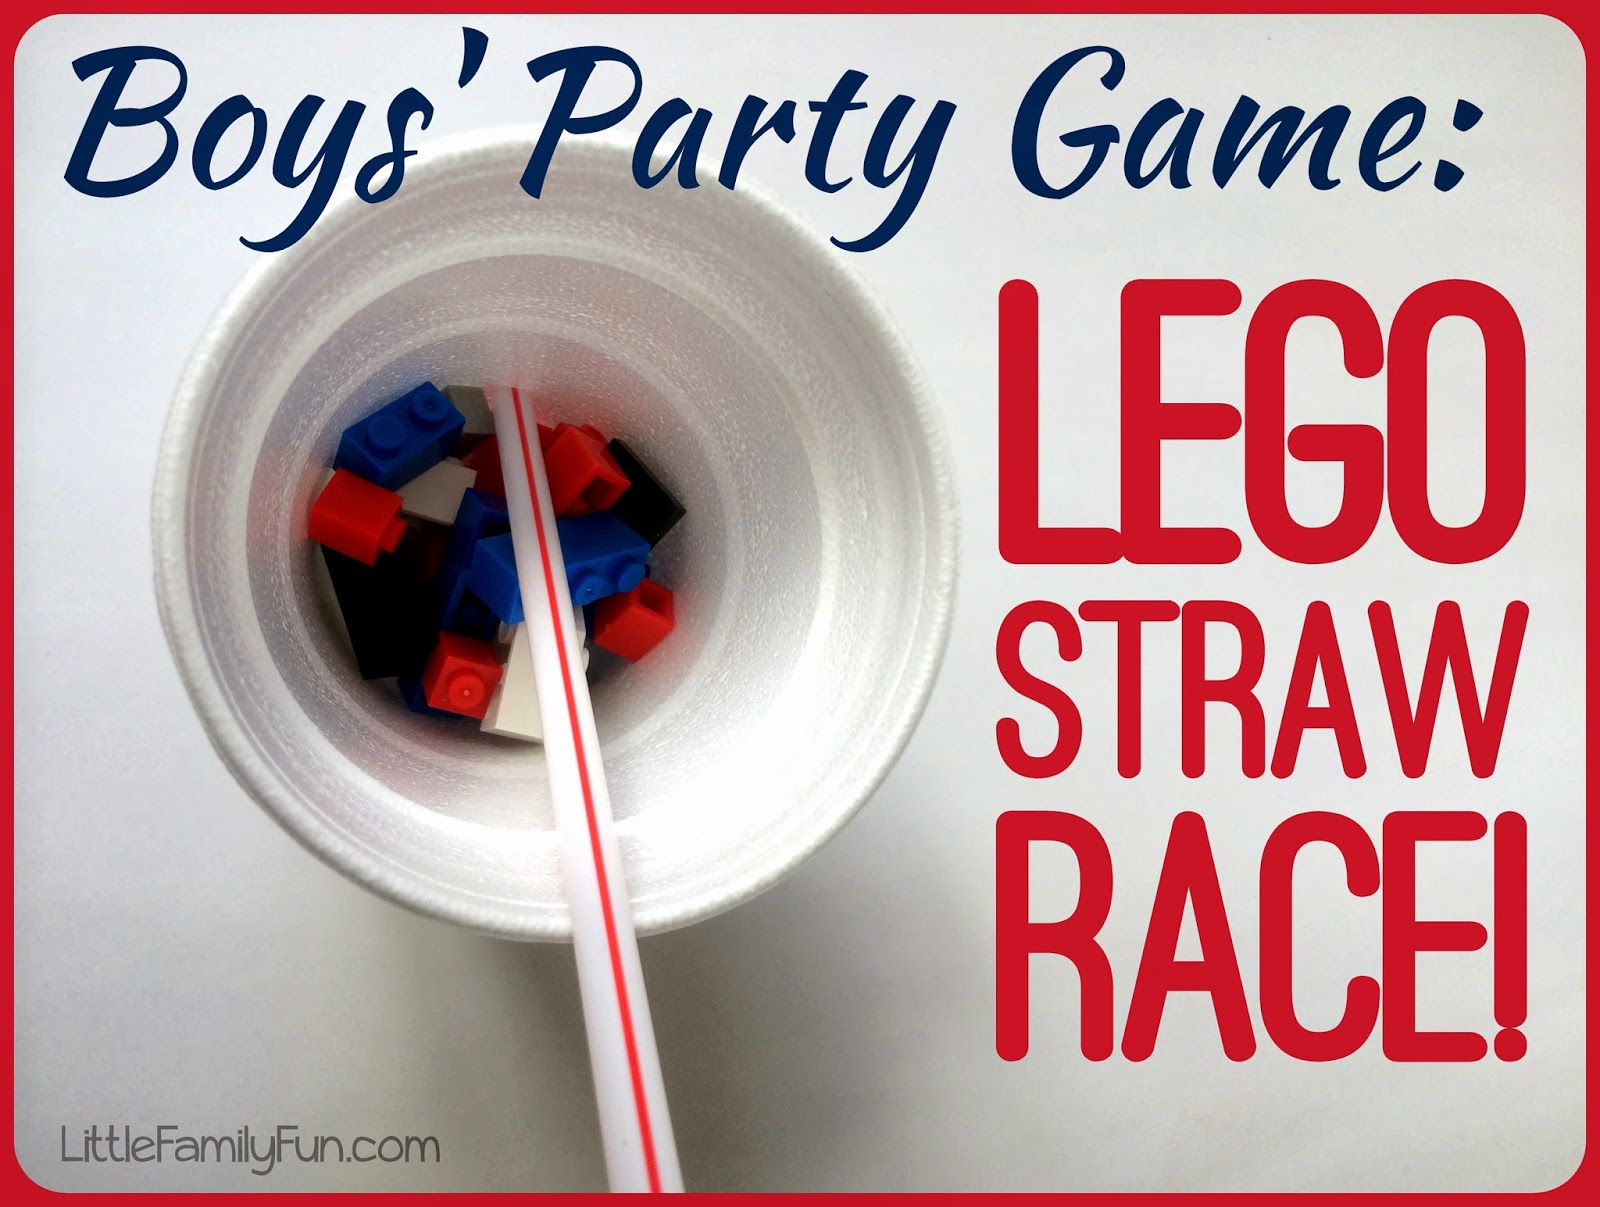 http://www.littlefamilyfun.com/2014/03/lego-straw-race.html